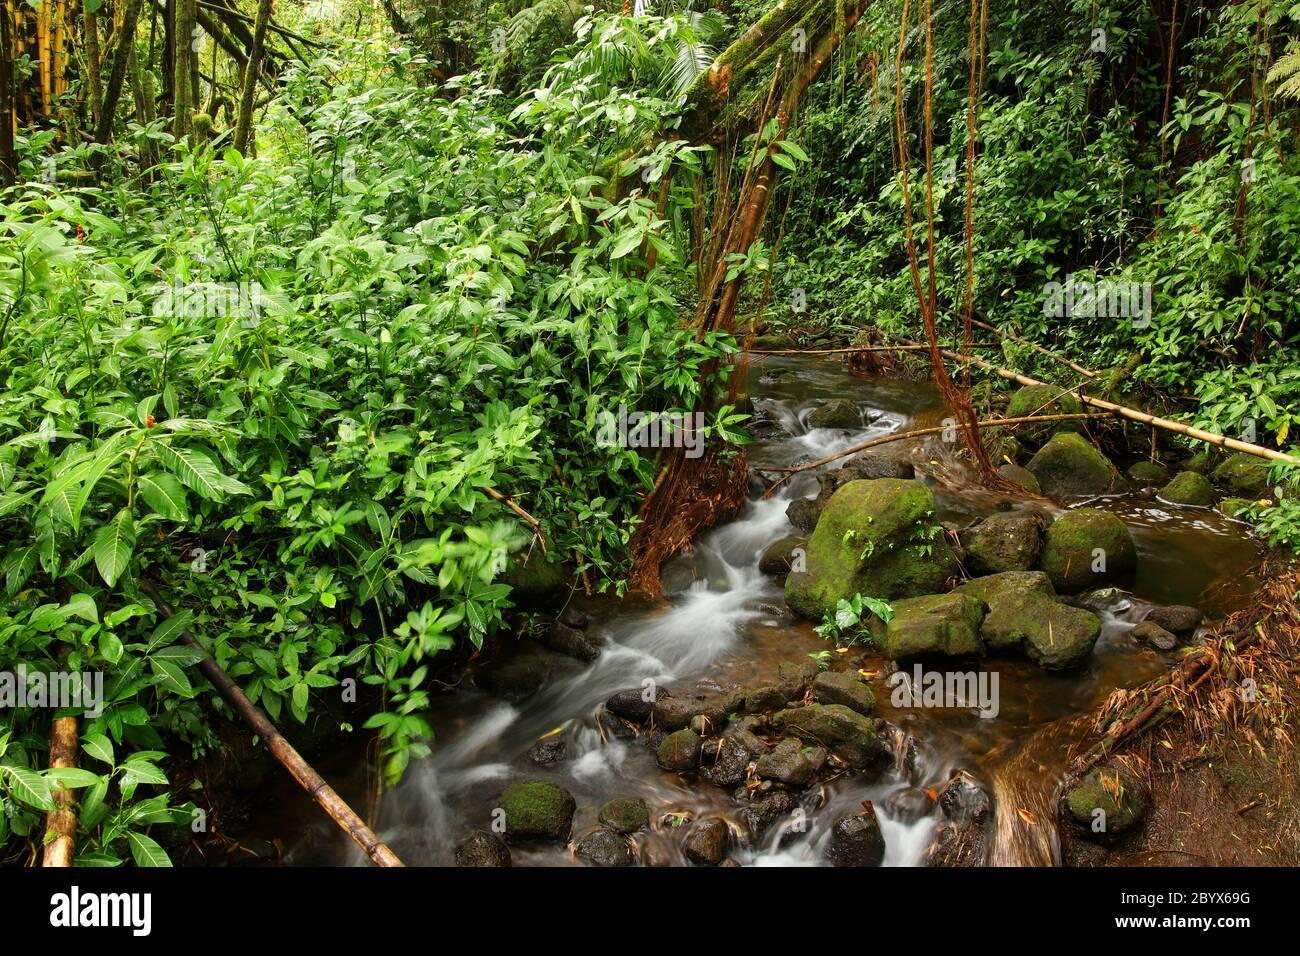 Scenic landscape with water stream inside rainforest. Akaka Falls State Park, Hawaii Big Island, USA. Stock Photo